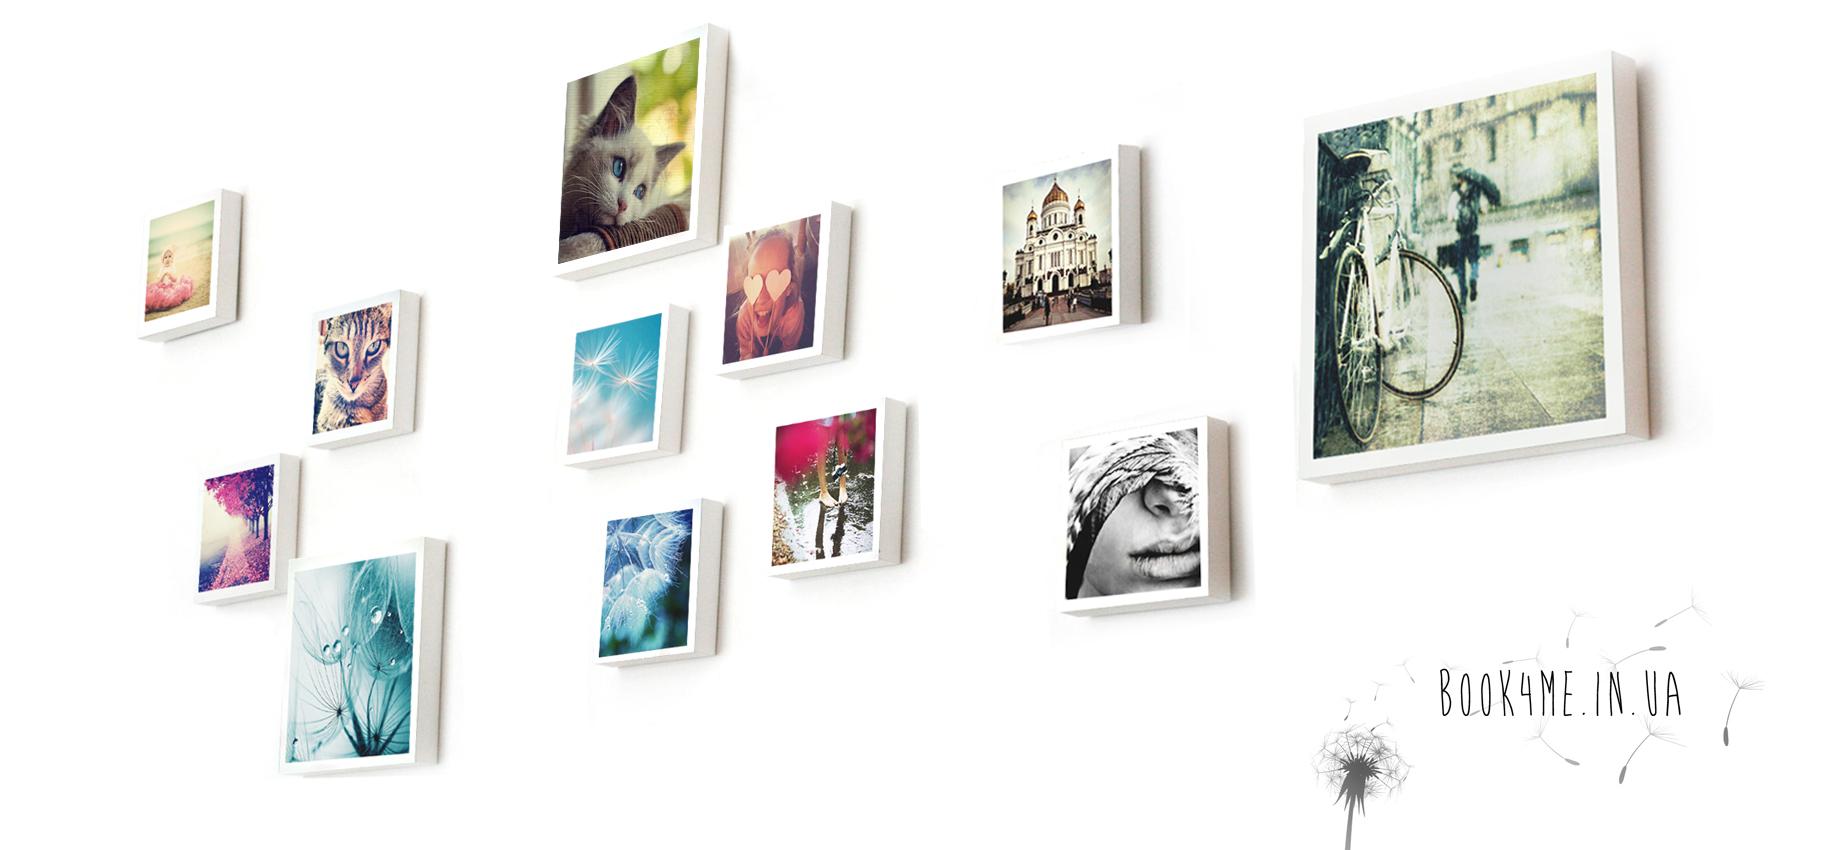 Печать фото на холсте, печать на холстах, печать картин на холстах, набор холстов на стену, ИнстаХолст